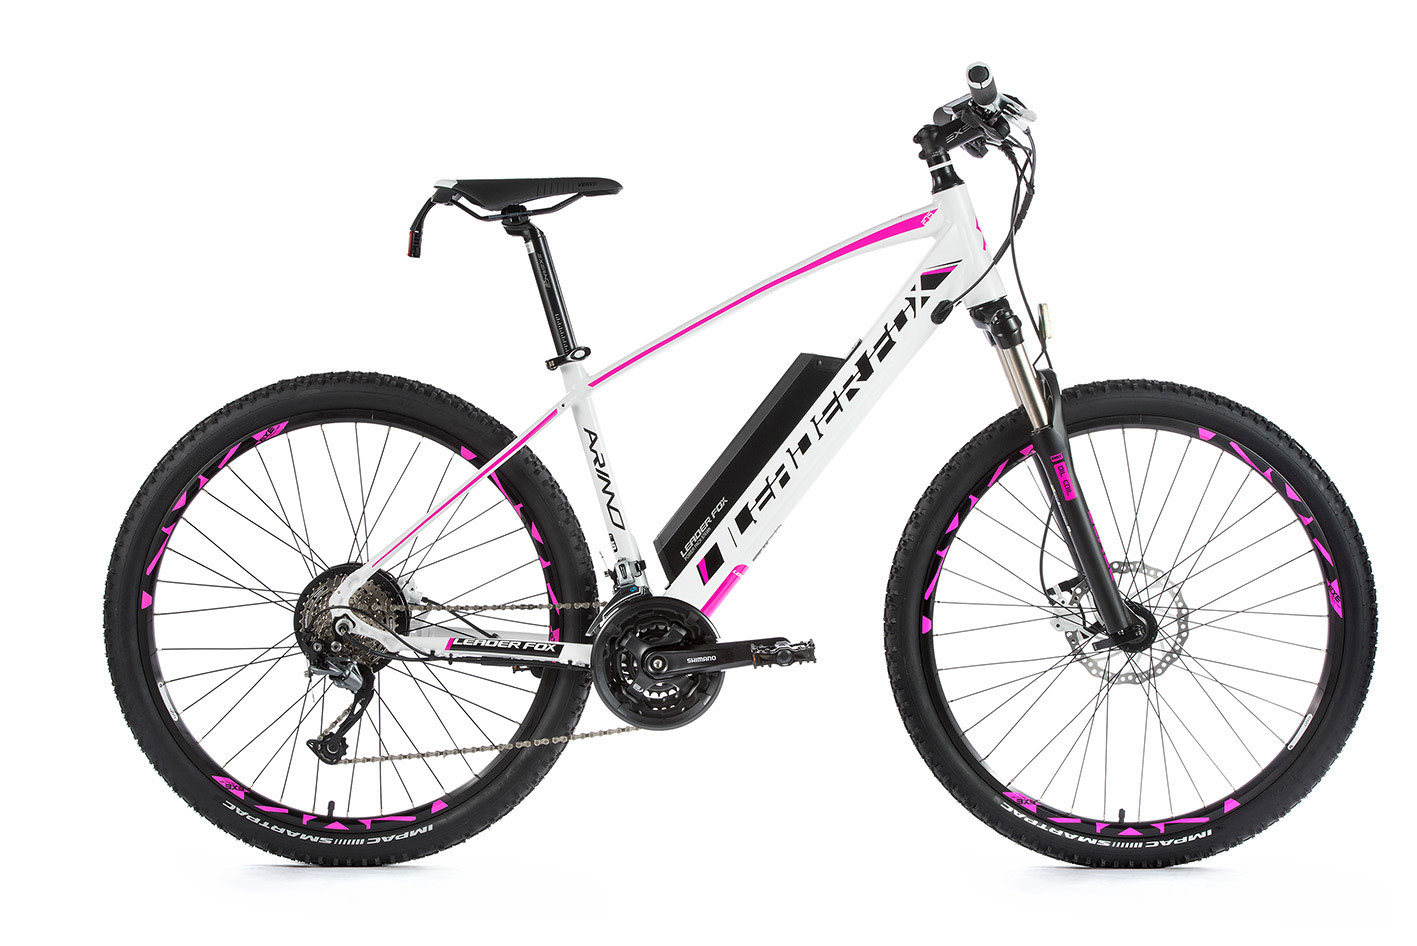 Bicicleta electrica MTB 27.5 inch Leader Fox Arimo